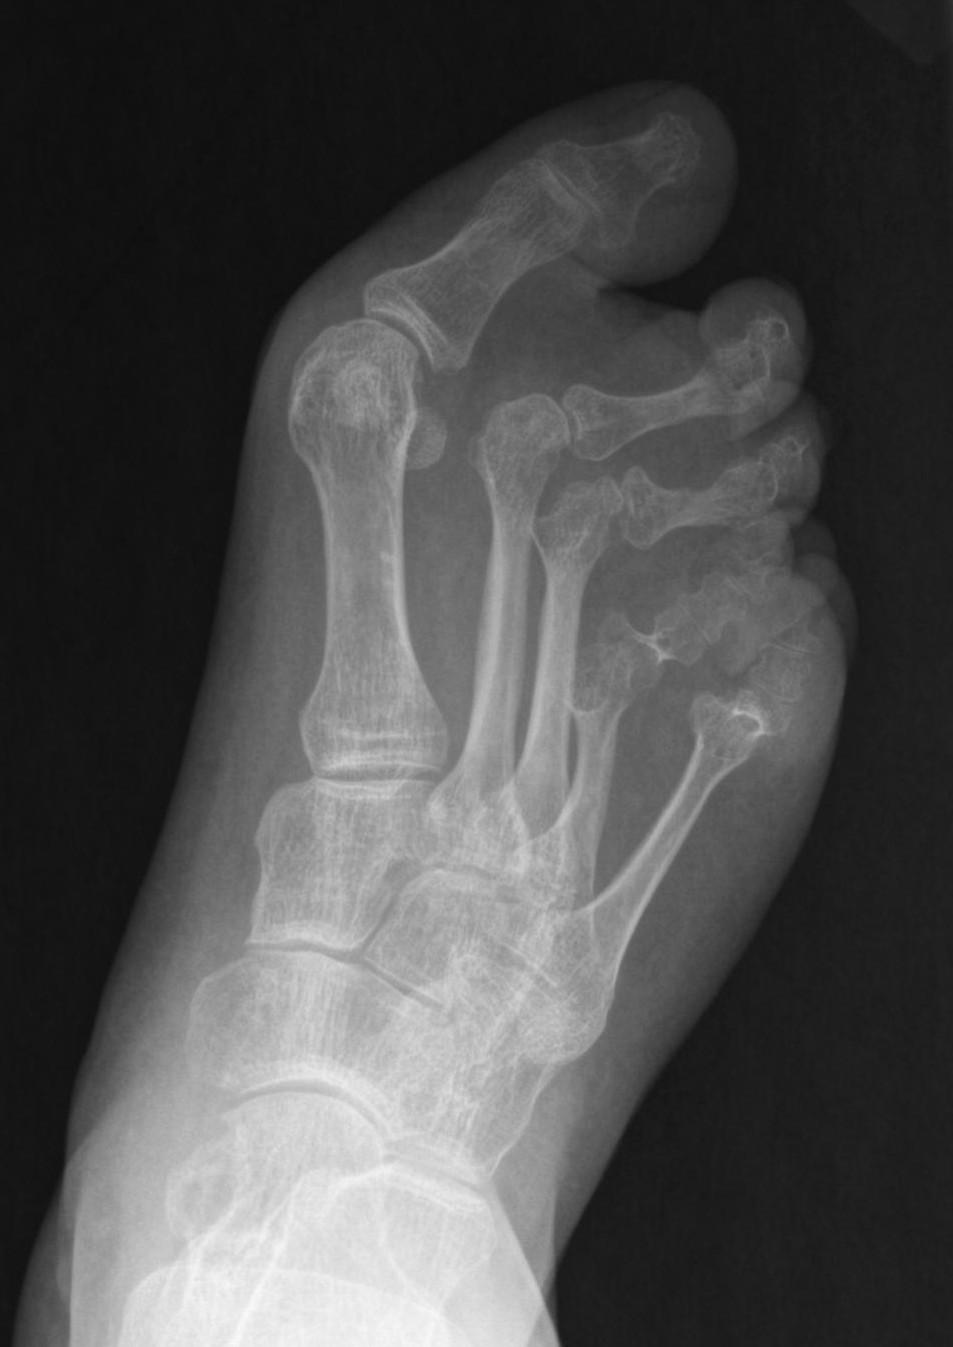 Abnormal Foot X Ray